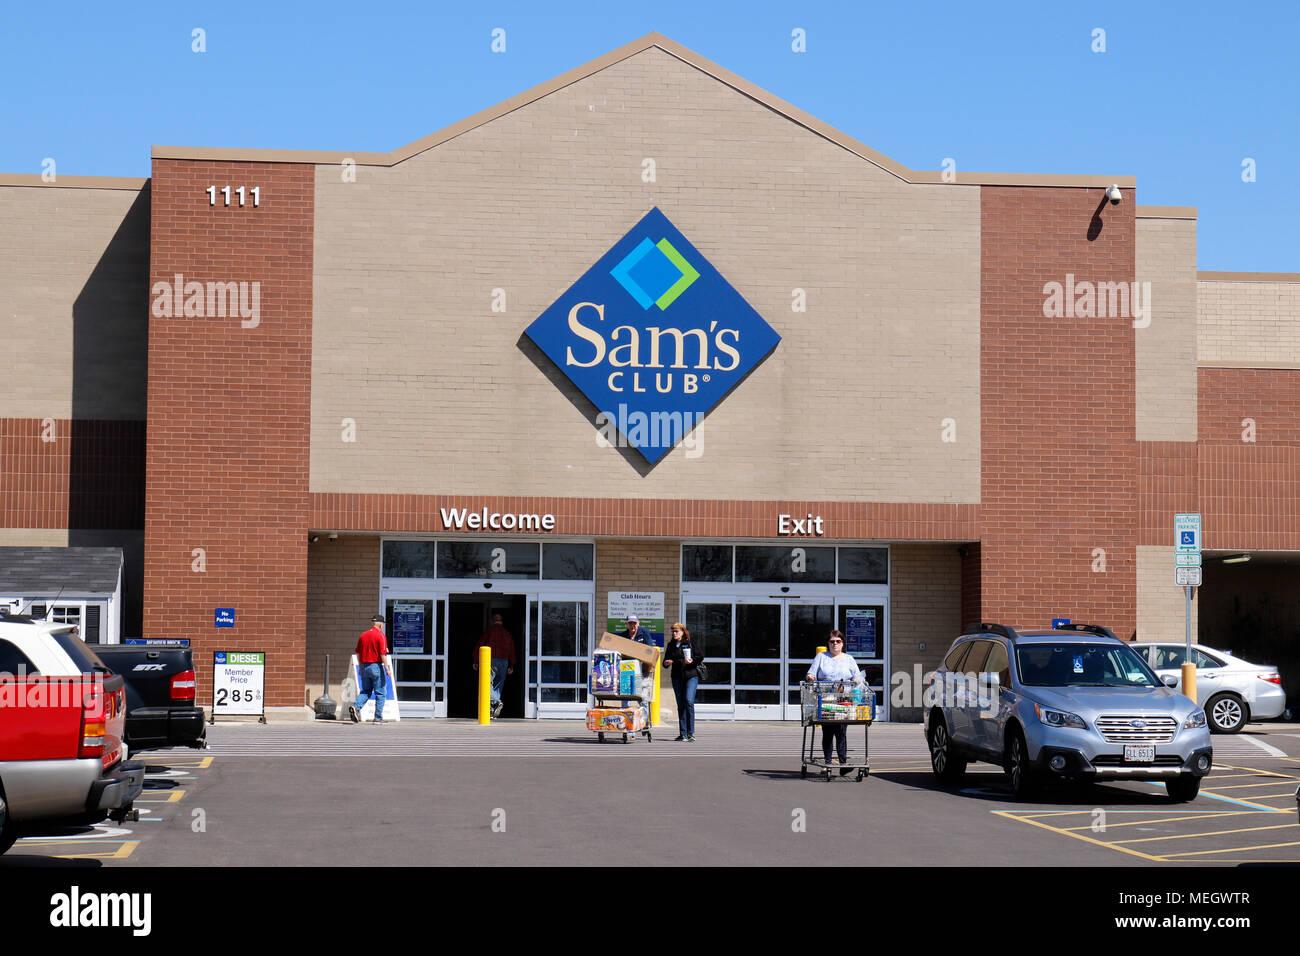 Sams Club Stock Photos & Sams Club Stock Images - Alamy